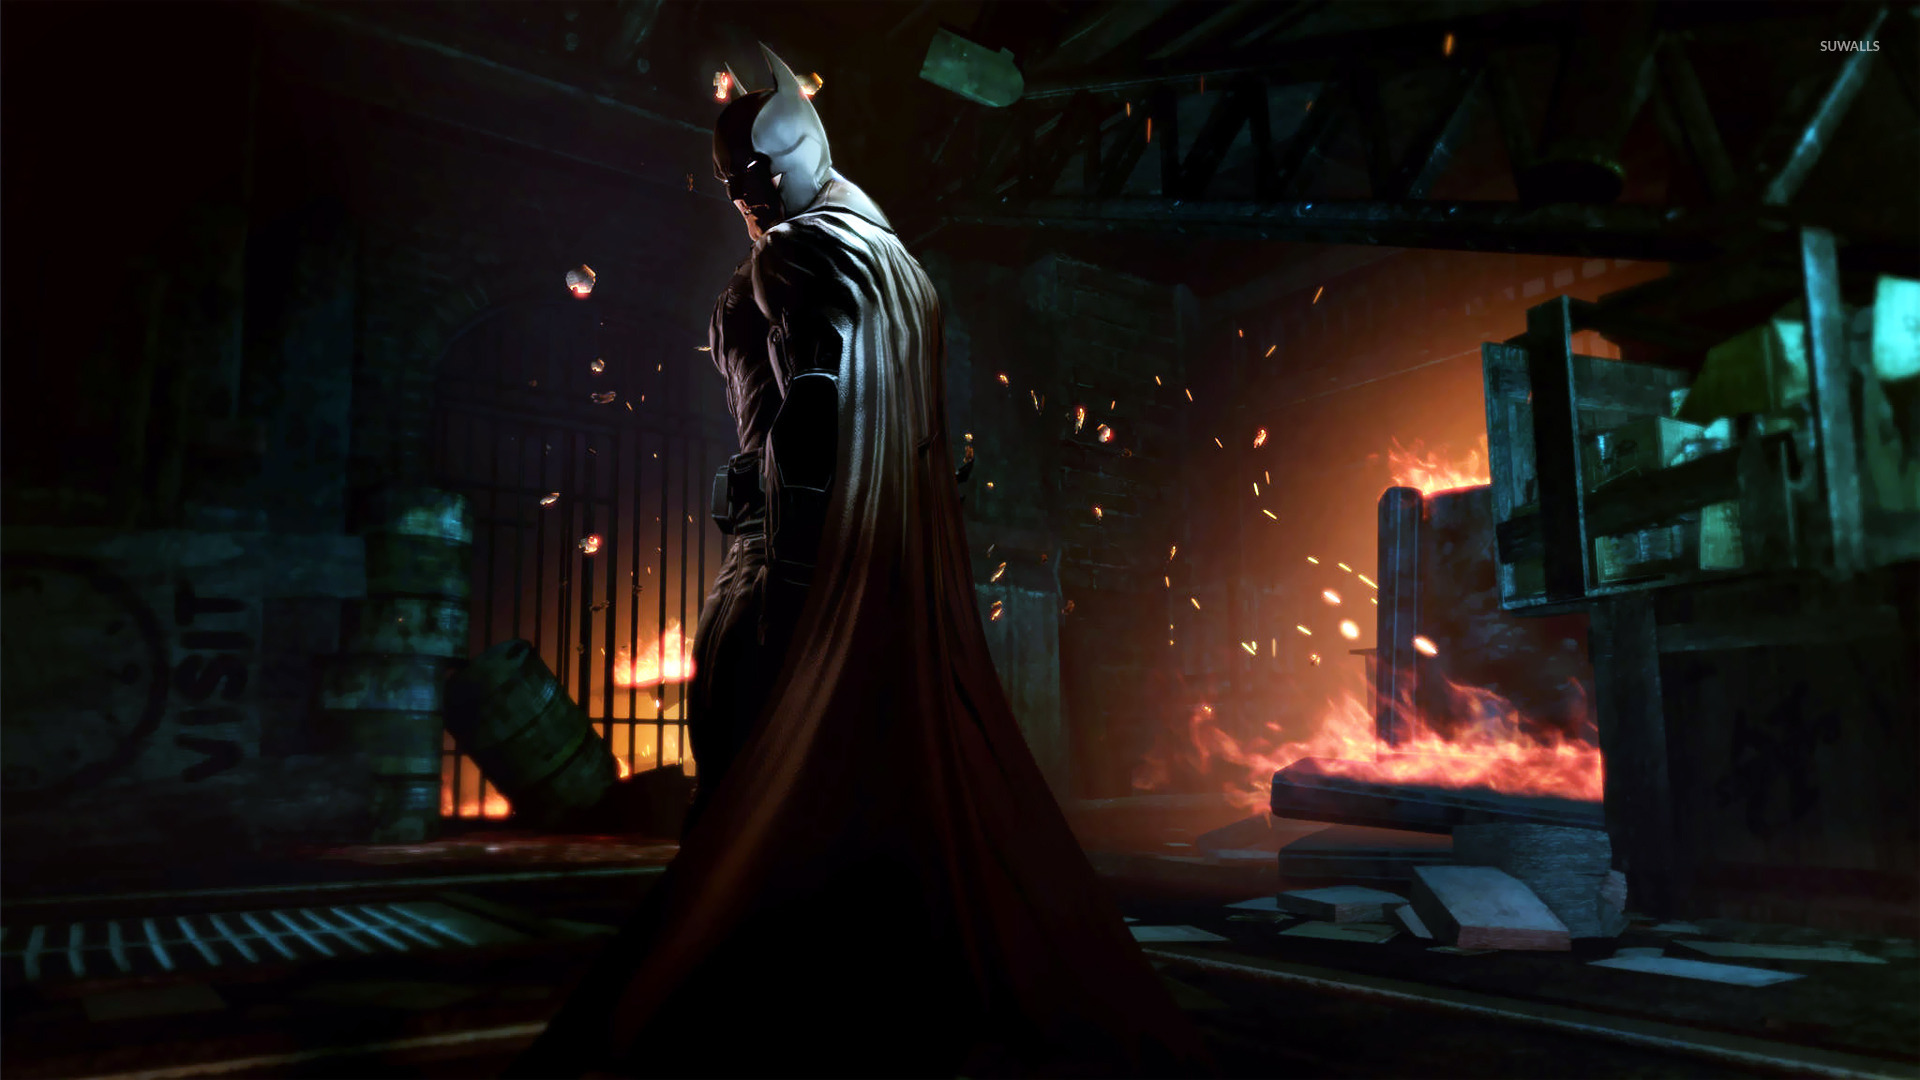 40k Quotes Wallpapers Batman Arkham Origins 7 Wallpaper Game Wallpapers